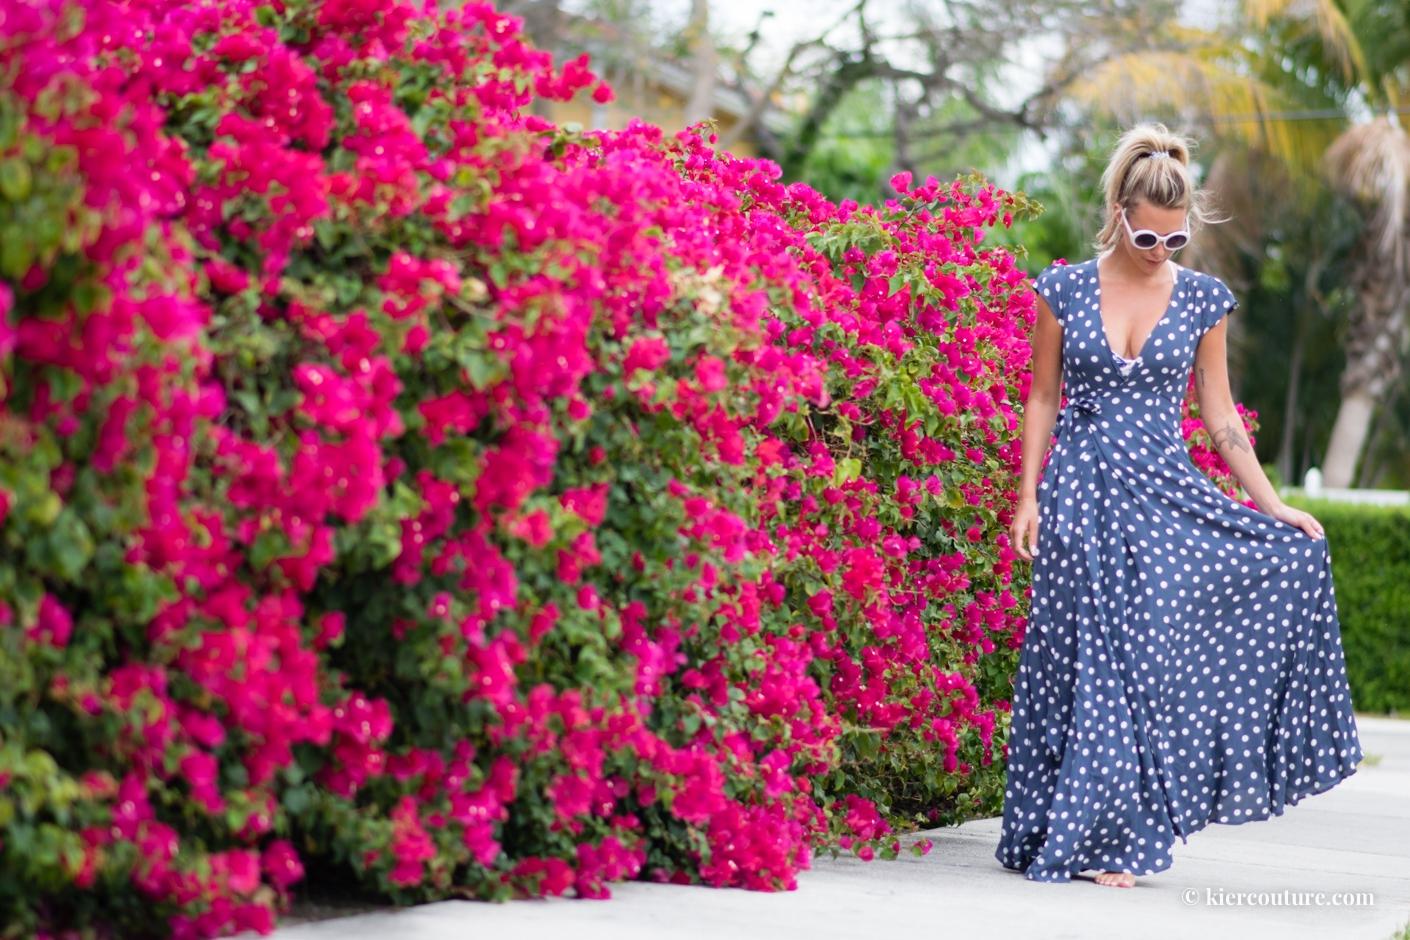 Kier Mellour in tularosa polkadot dress in ink blue